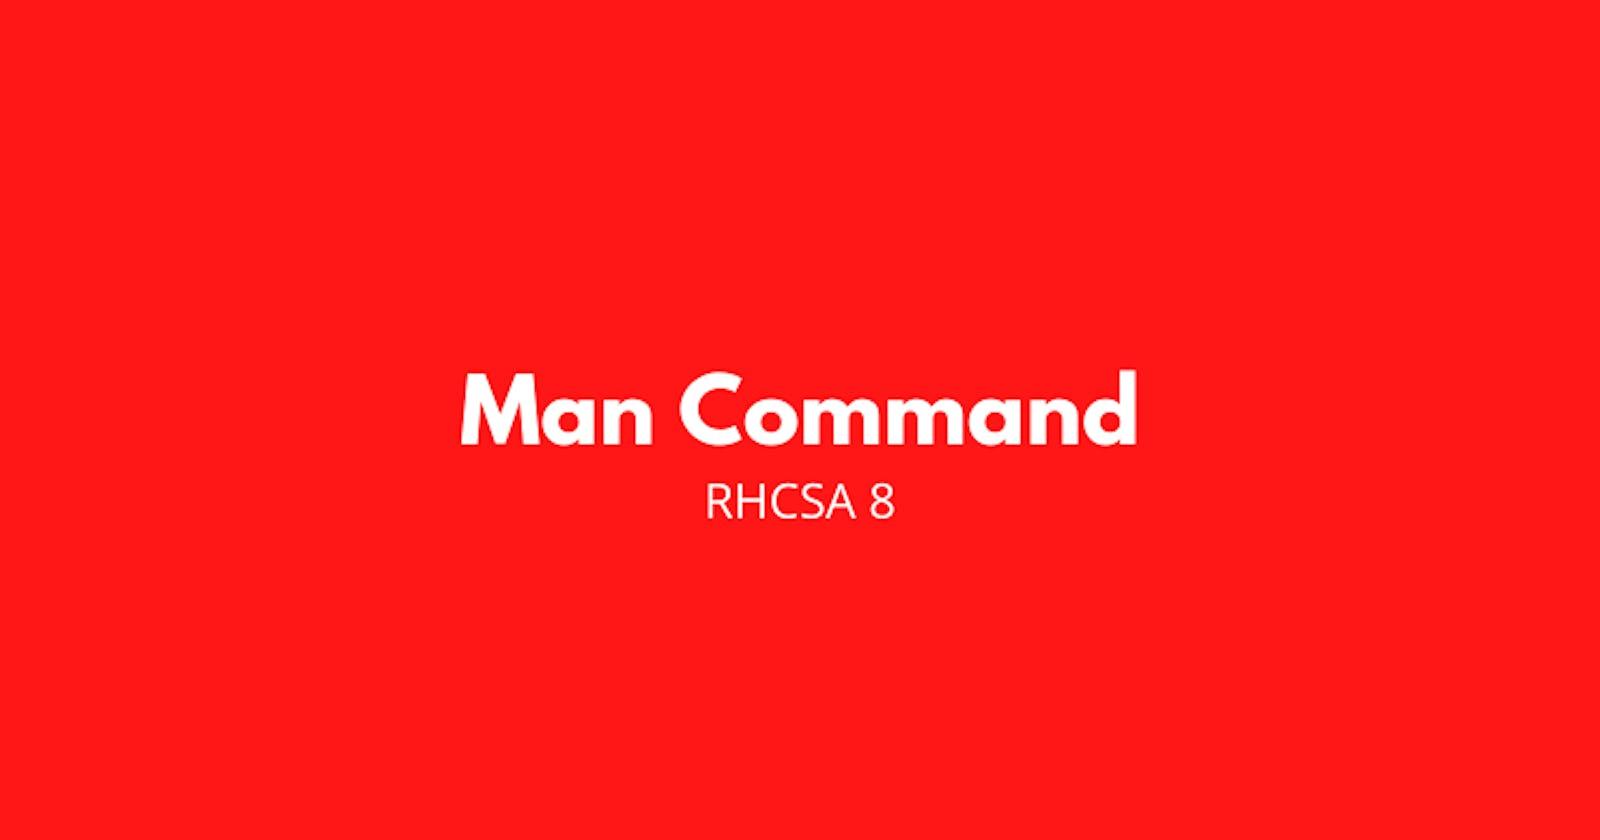 Man Command